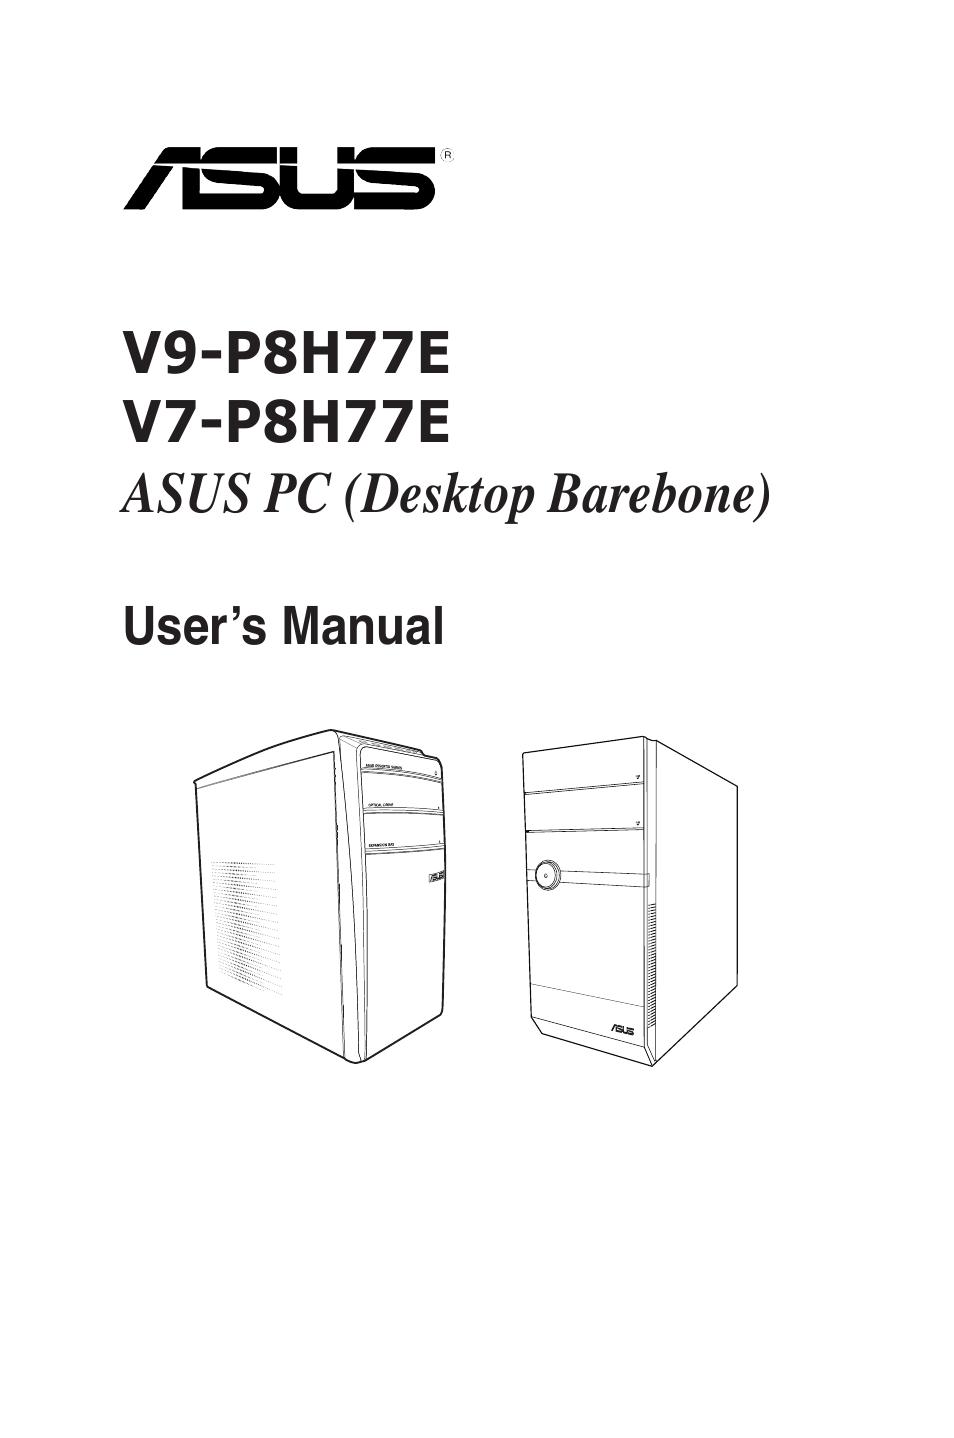 asus v9 p8h77e user manual 90 pages also for v7 p8h77e rh manualsdir com Desktop Computer Desktop Computer